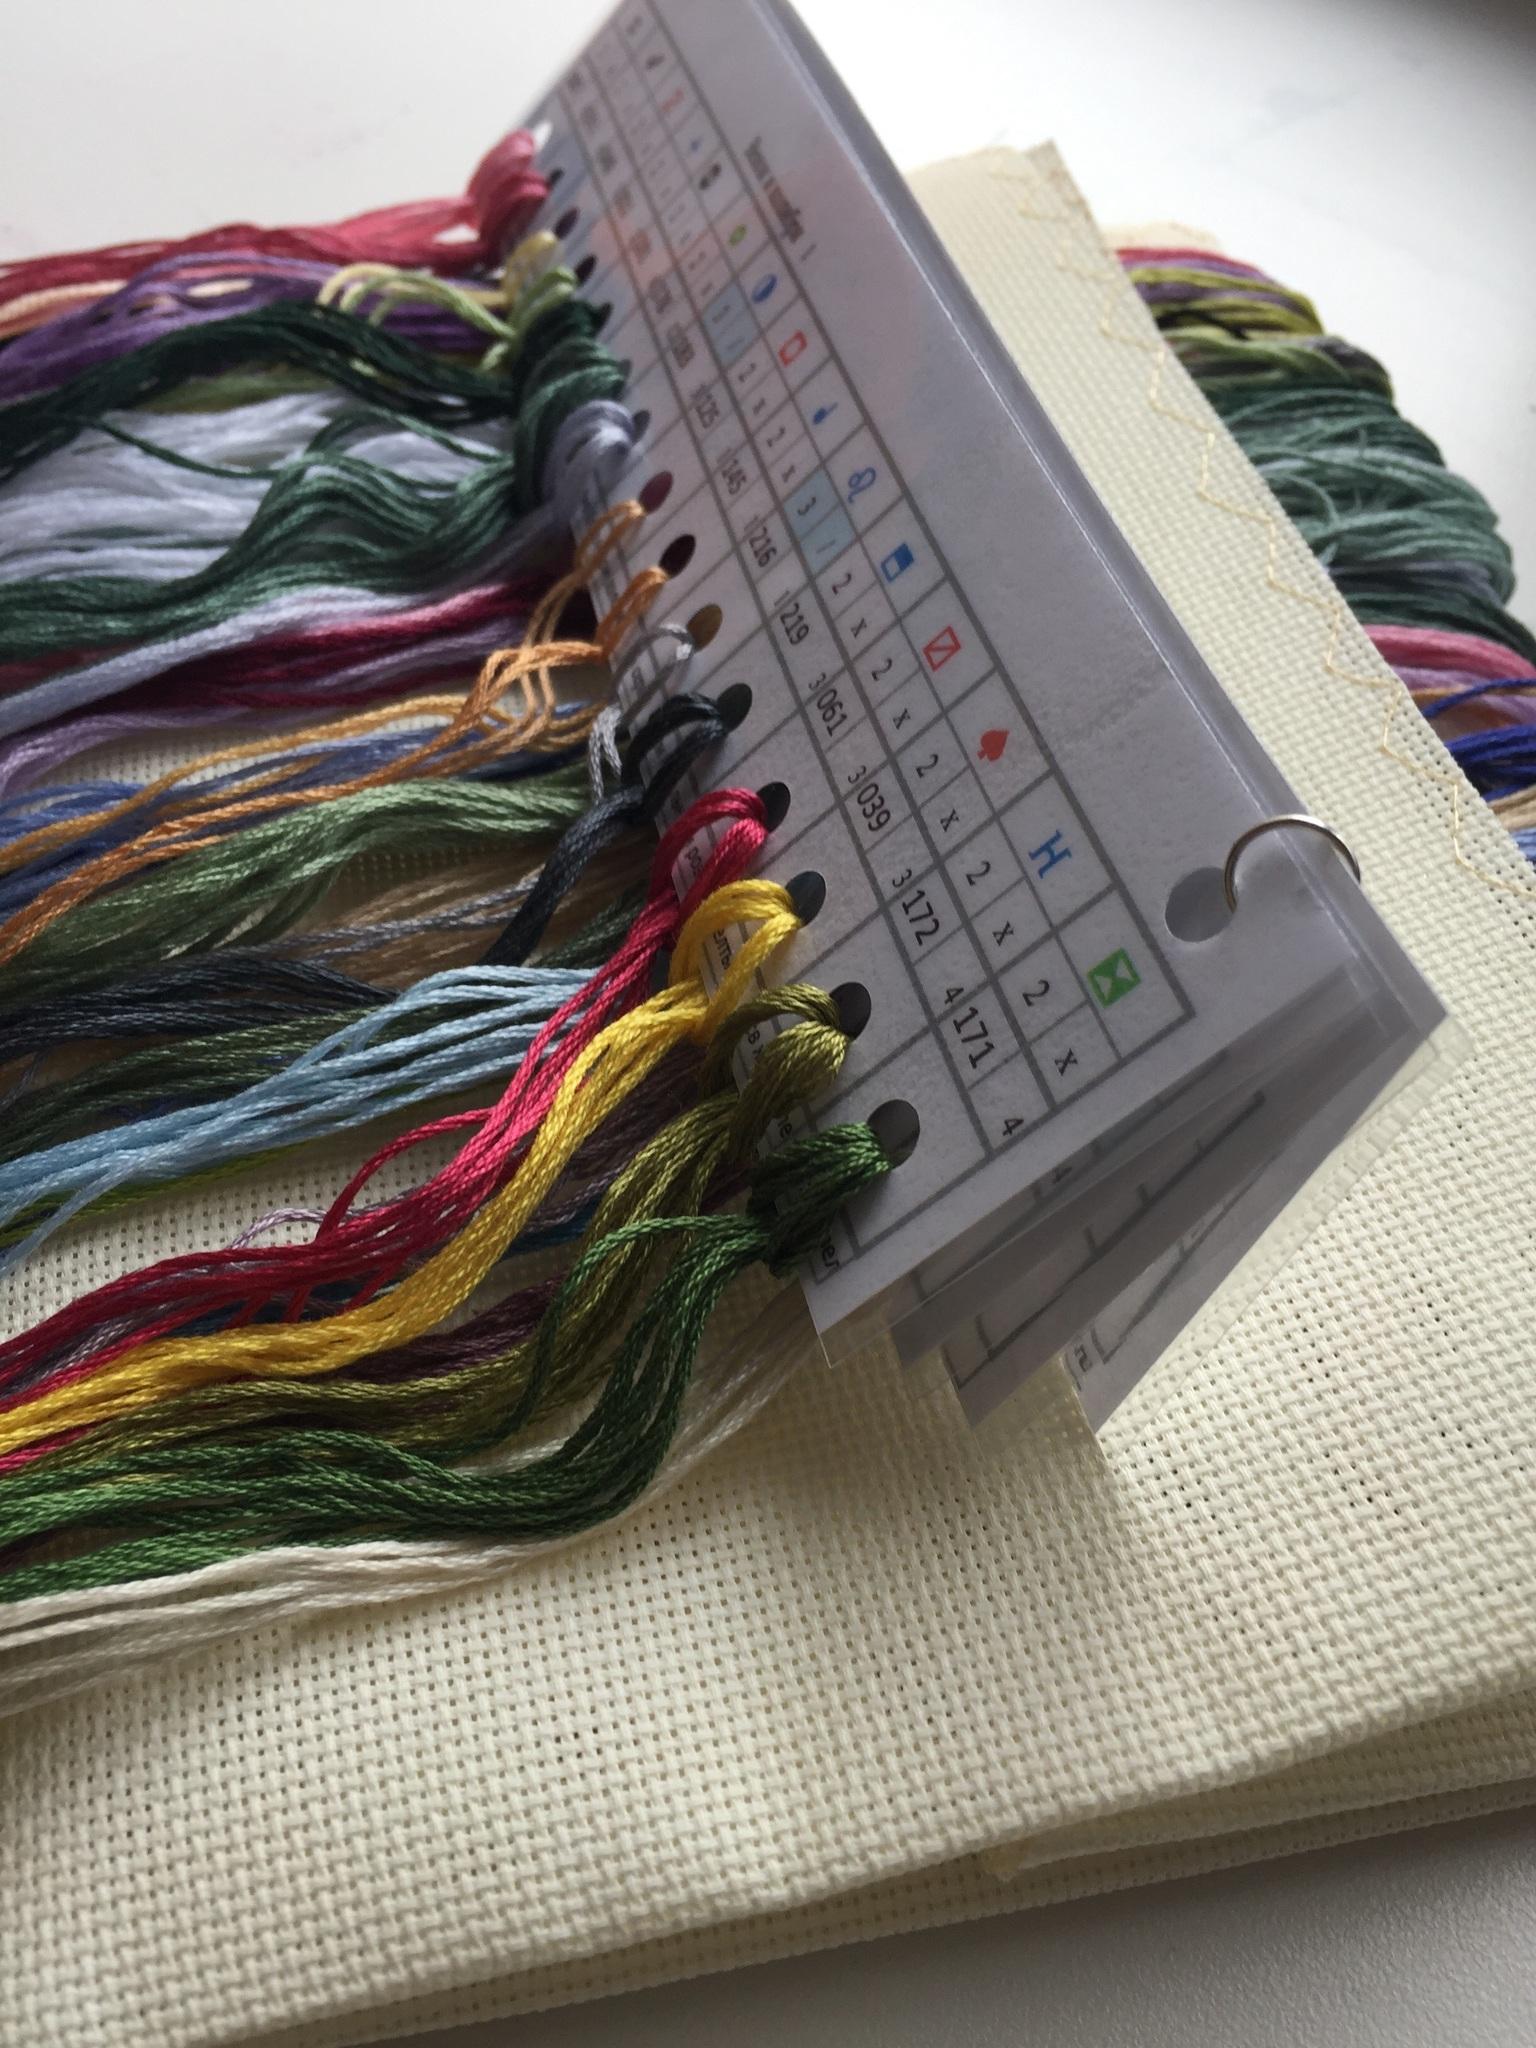 Набор для вышивания. Венок и колибри. Hummingbird Wreath. Артикул 35132